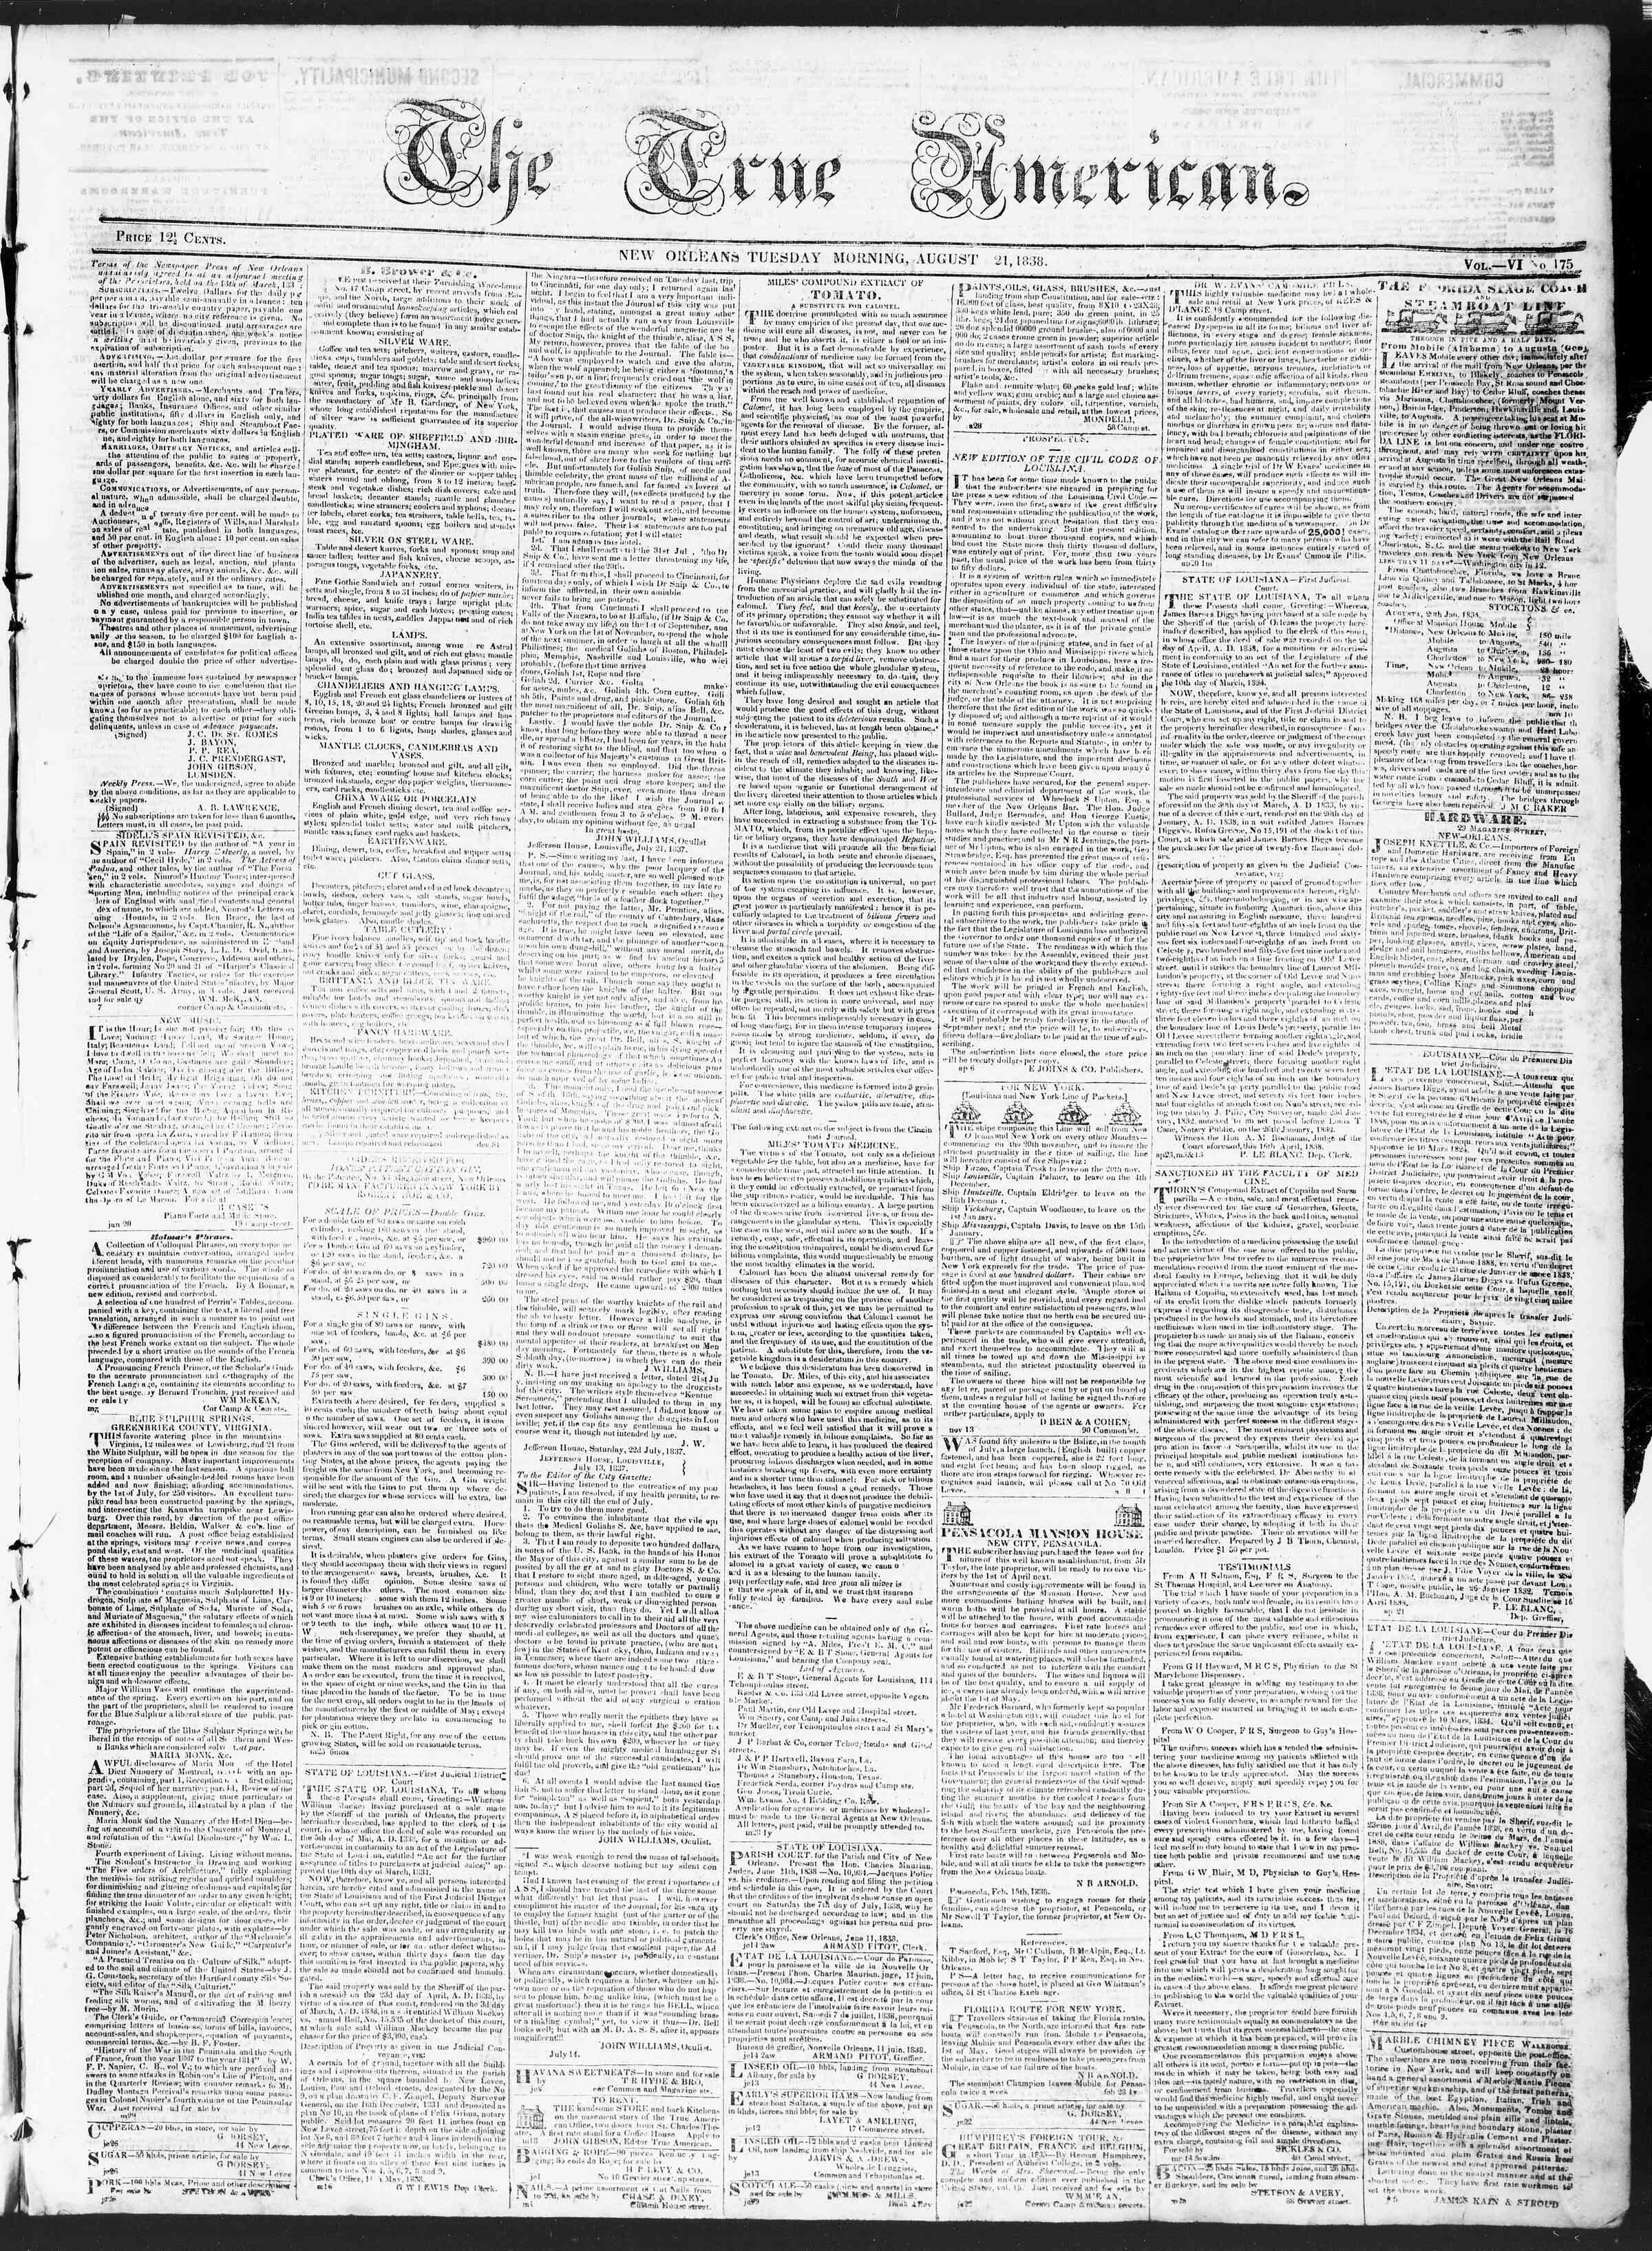 August 21, 1838 Tarihli True American Gazetesi Sayfa 1